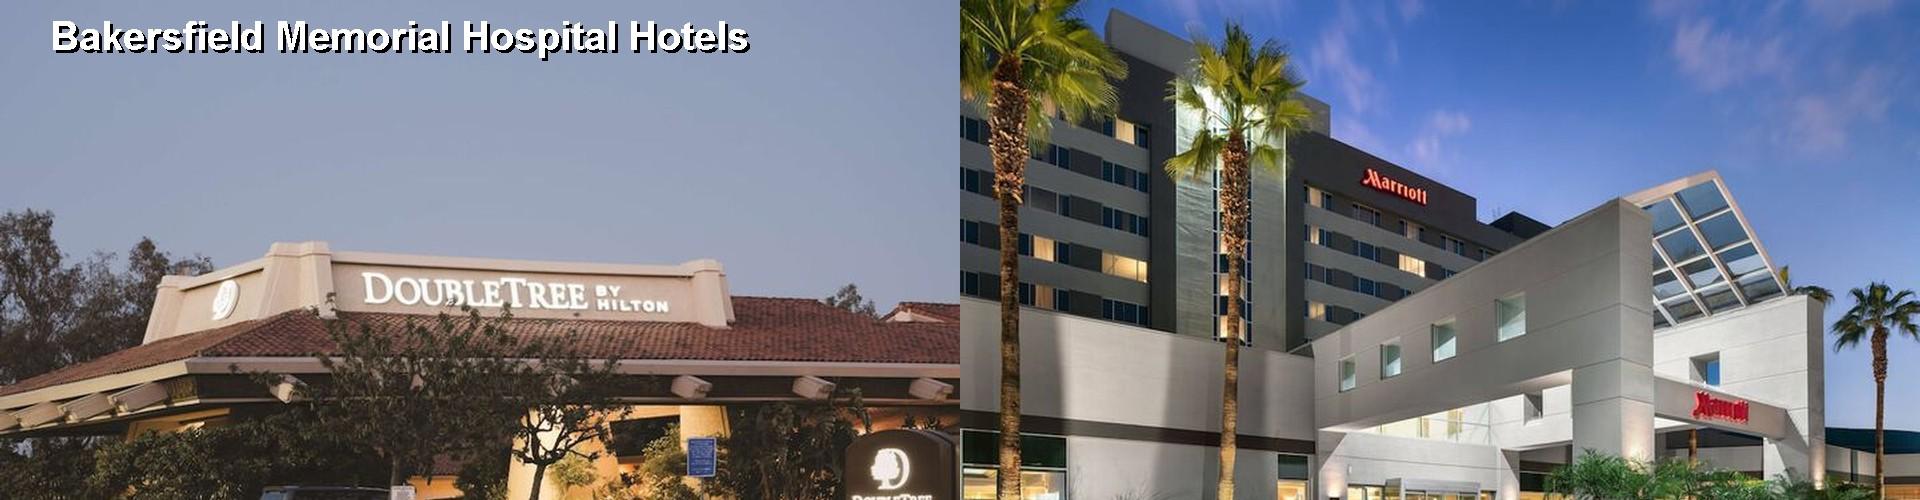 5 Best Hotels Near Bakersfield Memorial Hospital